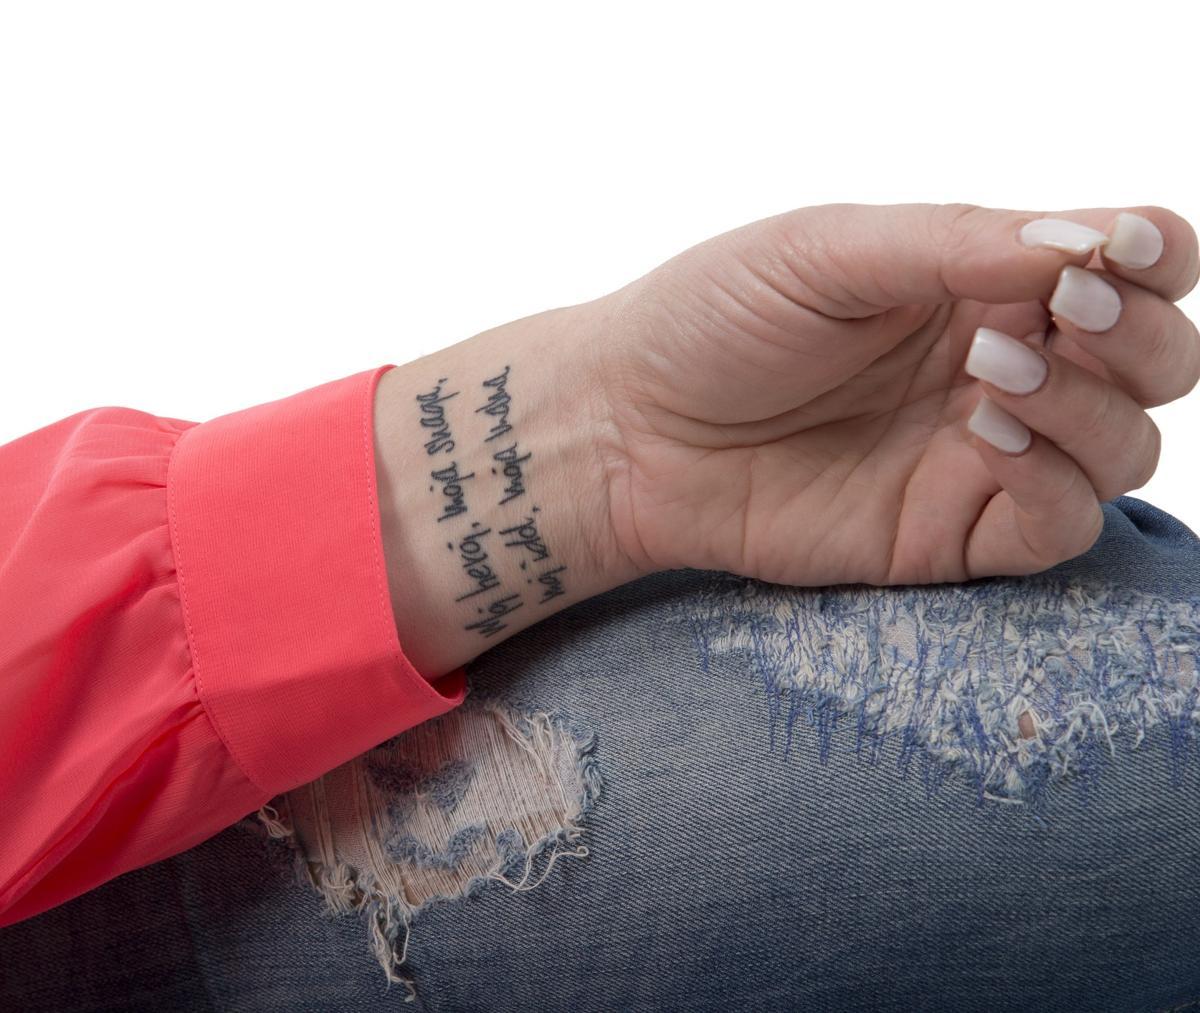 Blowball Text Tattoo: 9 Beautiful Tattoo Designs That Symbolize Hope